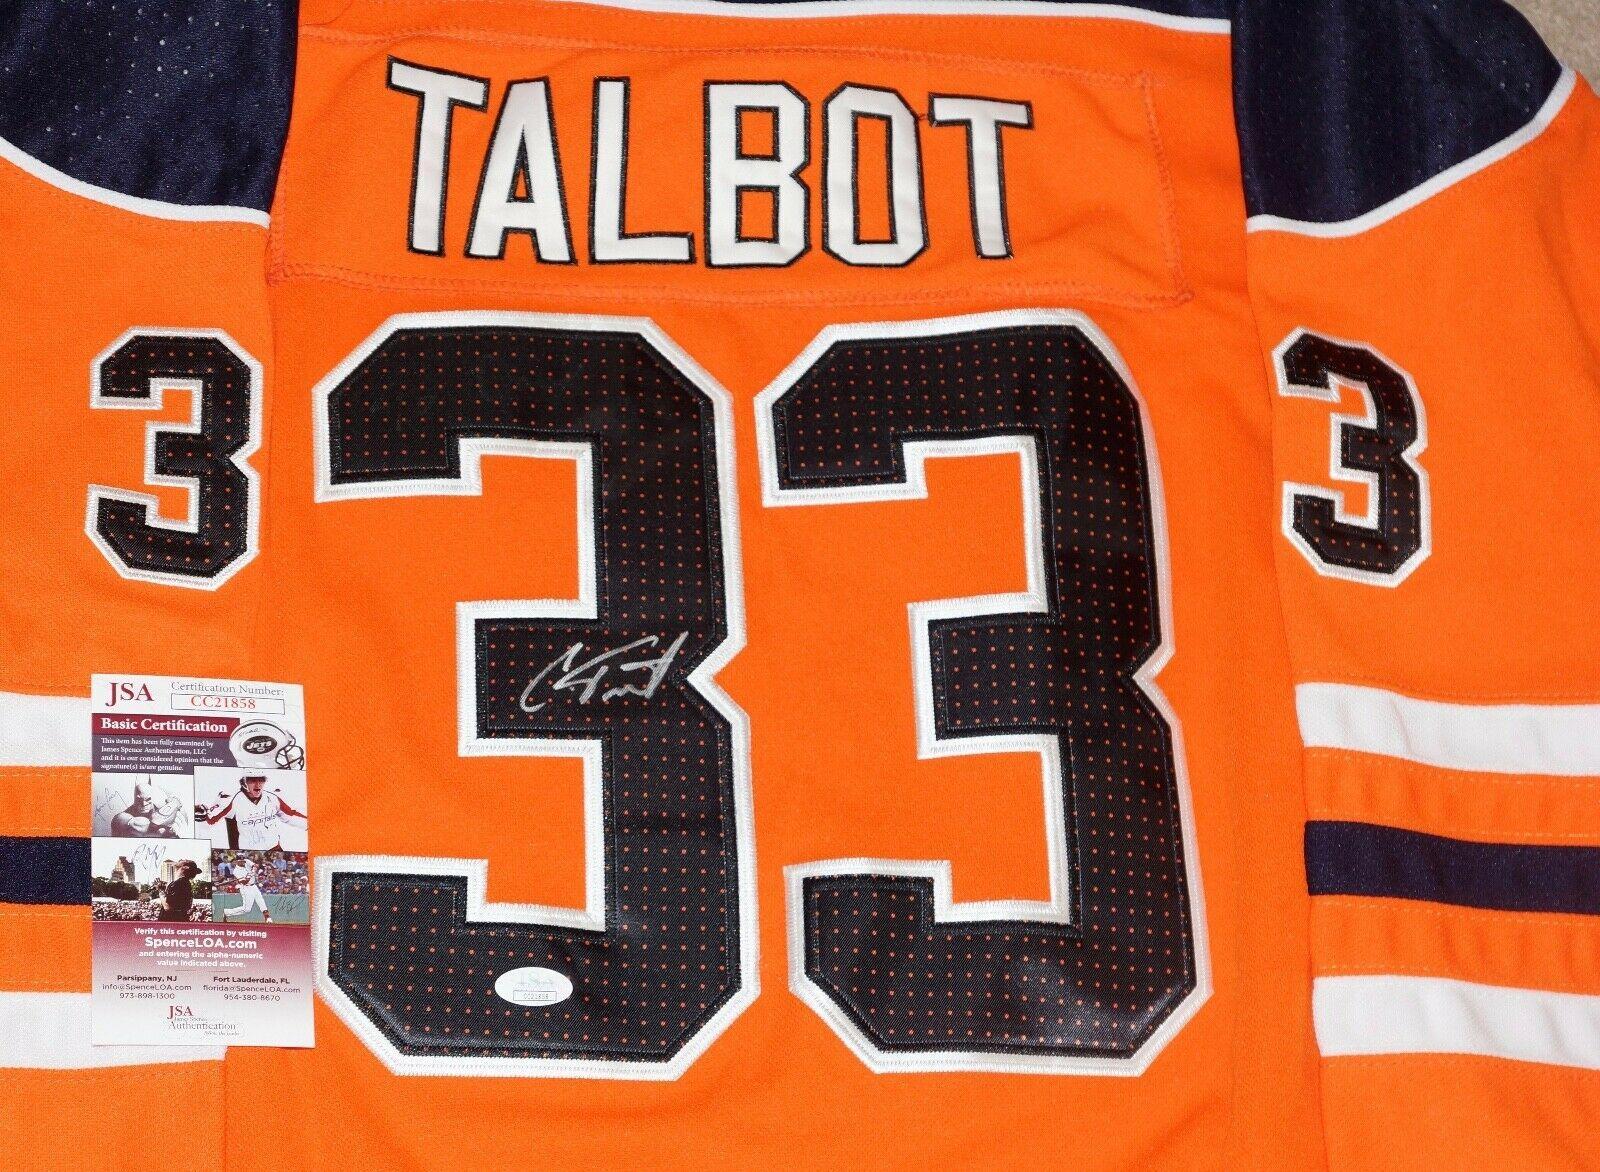 best service 6676d 209f4 Signed Cam Talbot Jersey - #33 + JSA COA #CC21858